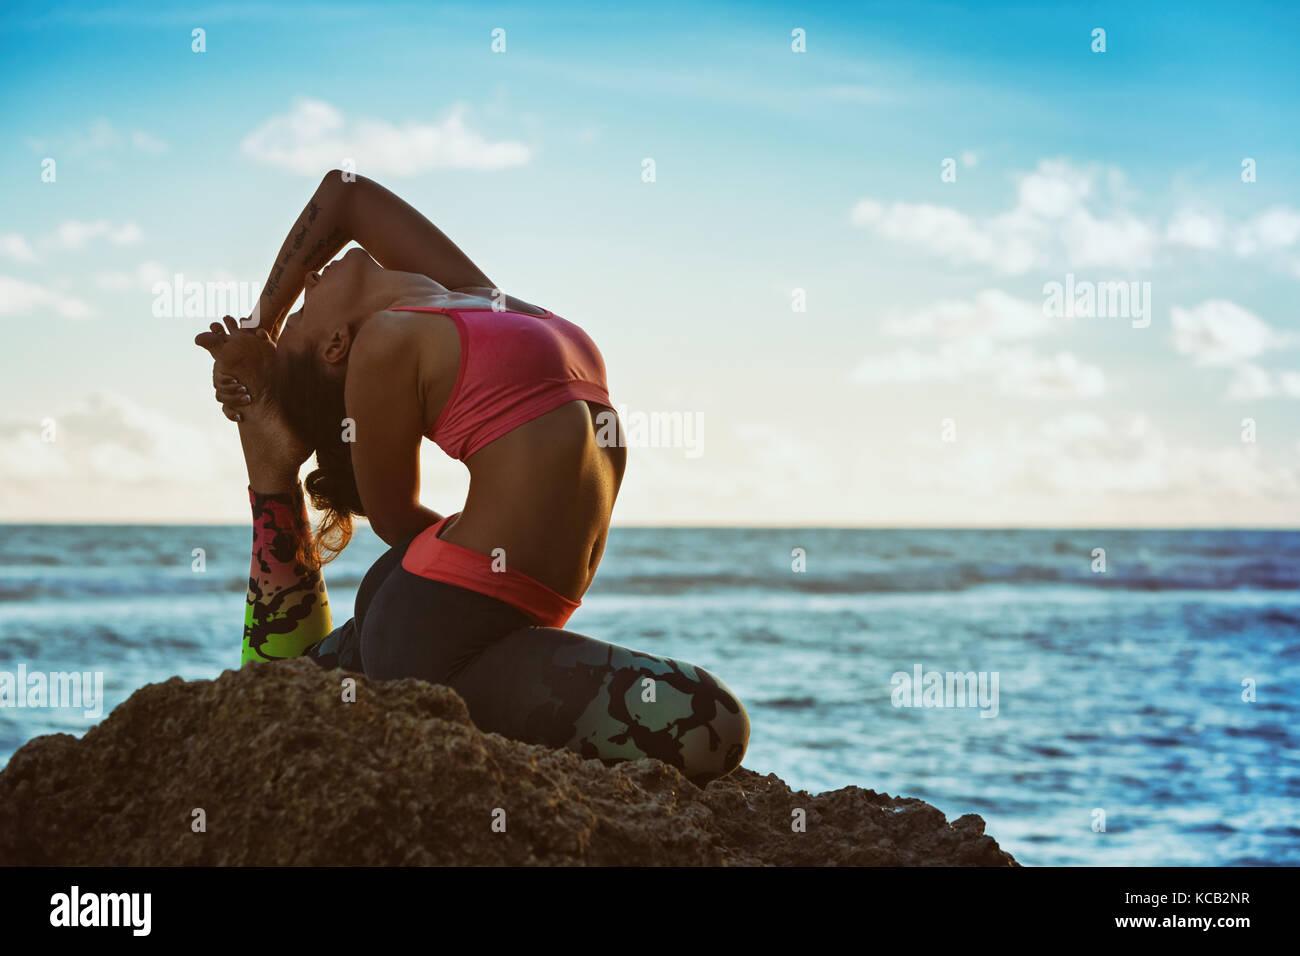 Meditation über Sonnenuntergang Himmel Hintergrund. Junge aktive Frau sitzen in Yoga pose am Strand Felsen, Stockbild